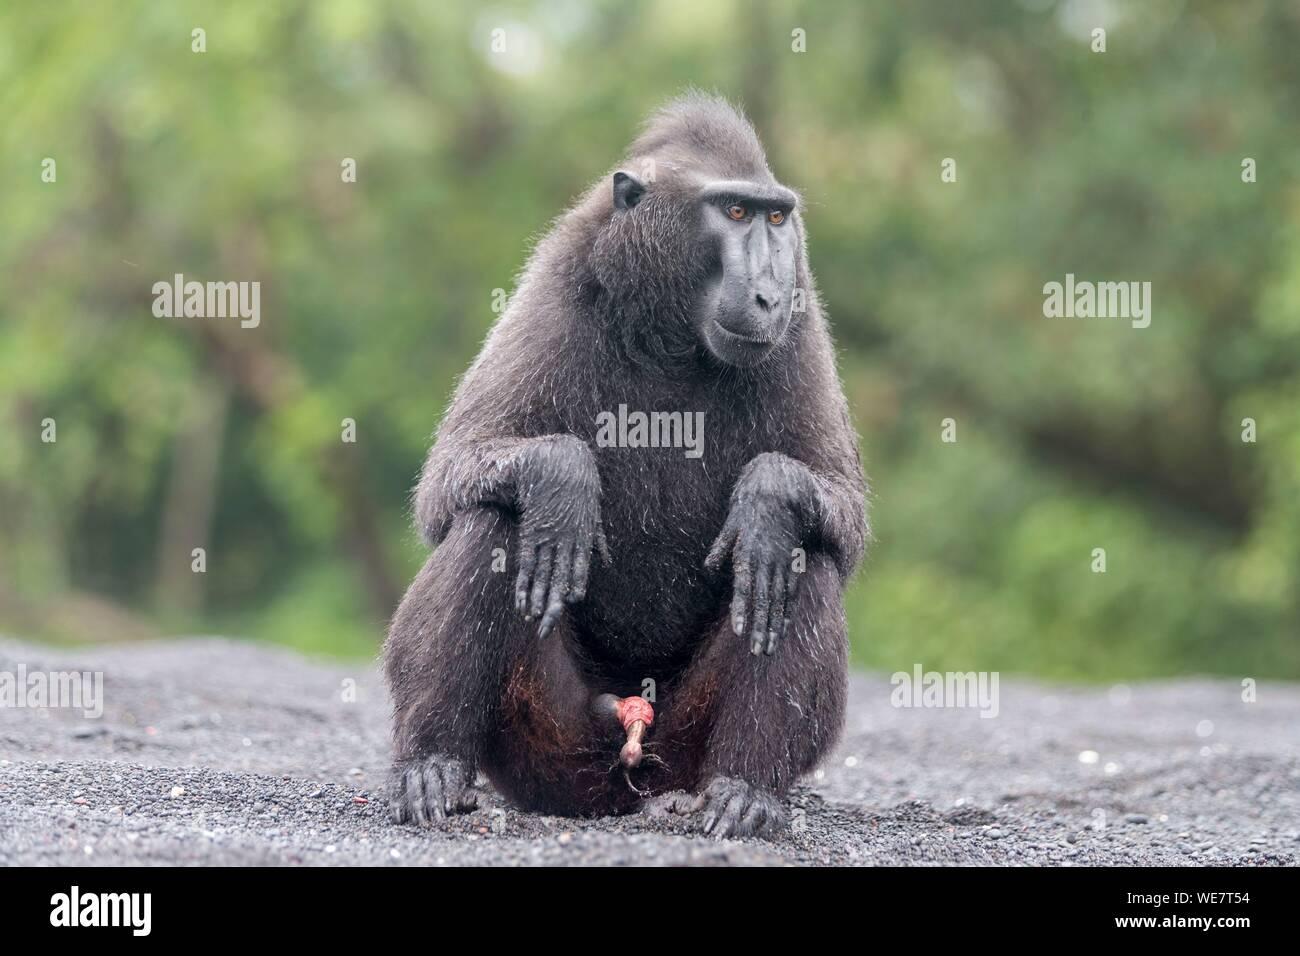 Indonesia, Celebes, Sulawesi, Tangkoko National Park, Celebes crestata o macaco crestato macaco nero, Sulawesi crested macaco o il black ape (Macaca nigra) Foto Stock